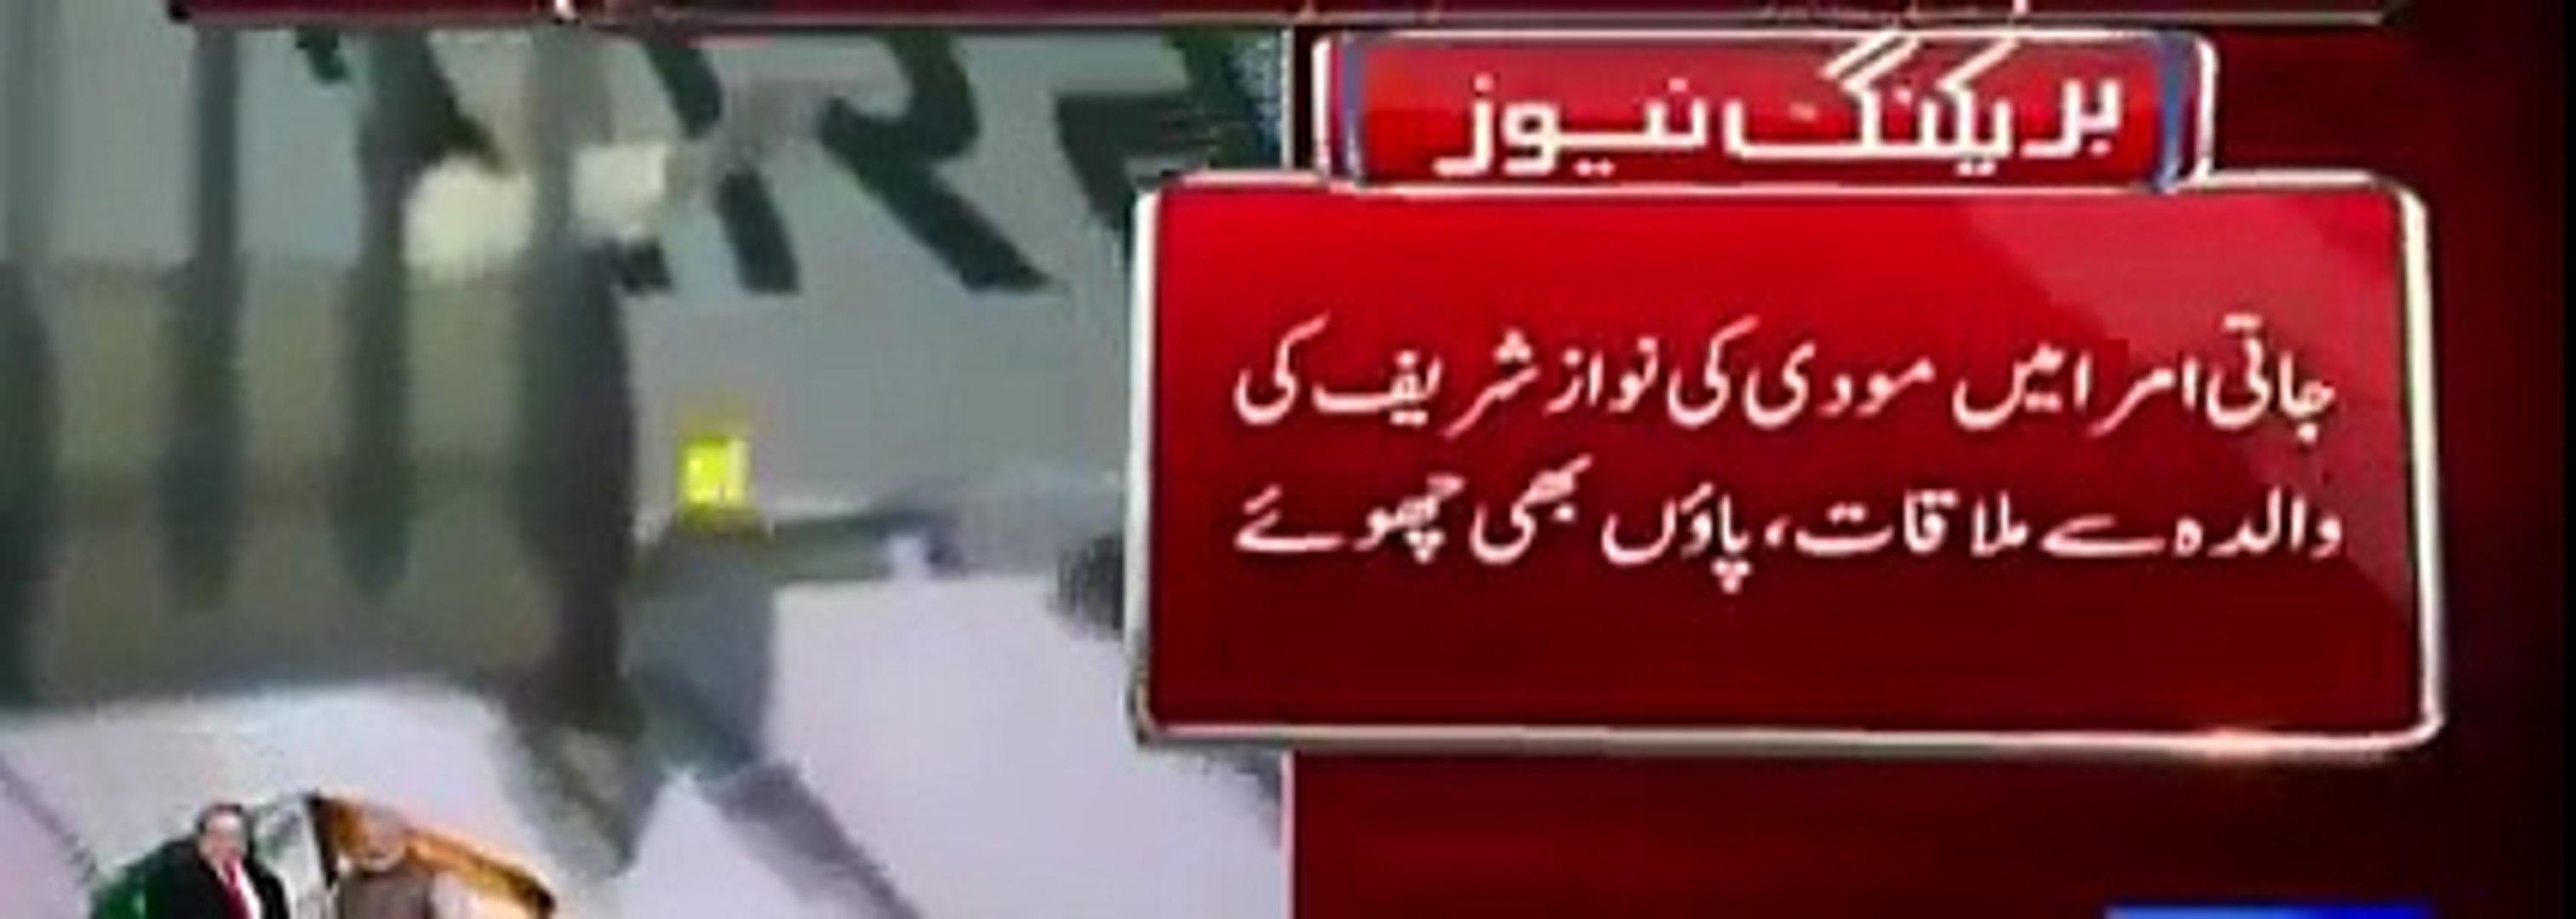 Modi Visit to Pakistan December 25_ Pakistani Media Reaction on Modi visit latest this week